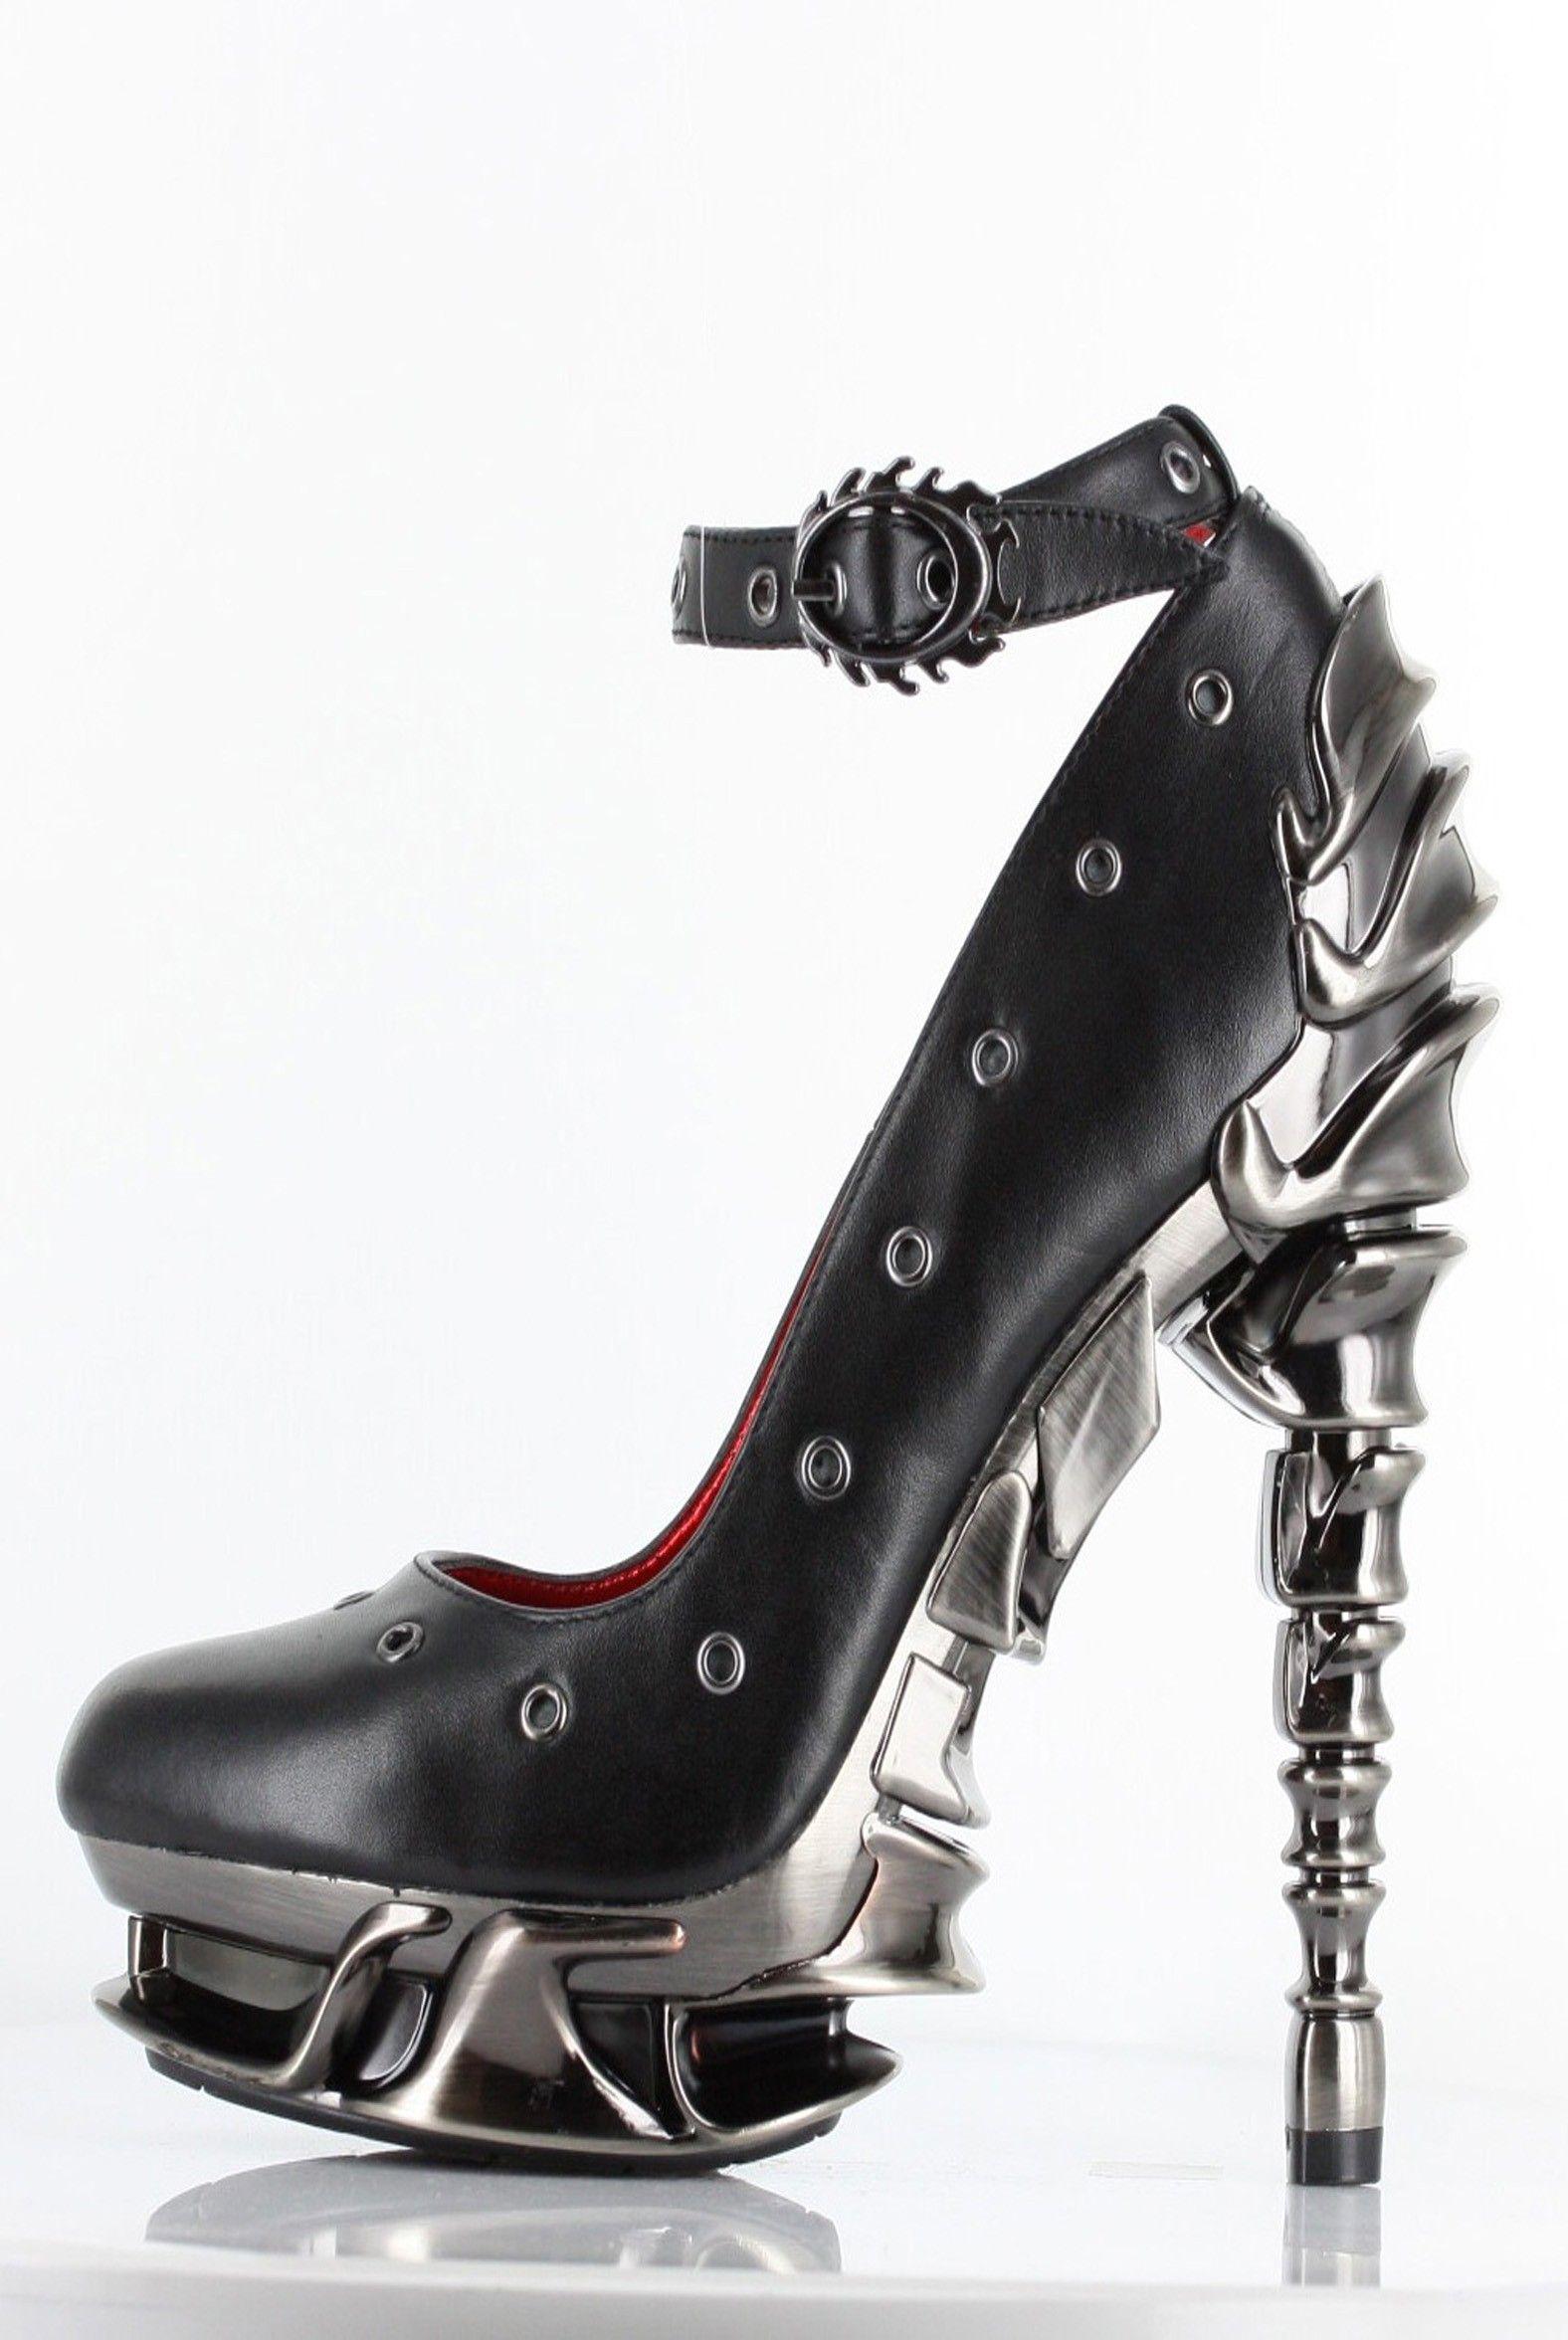 89729265e Hades Shoes - Zephyr - Black - Goth Metal Emo Scene Alternative Black Heel  - Salient Seven